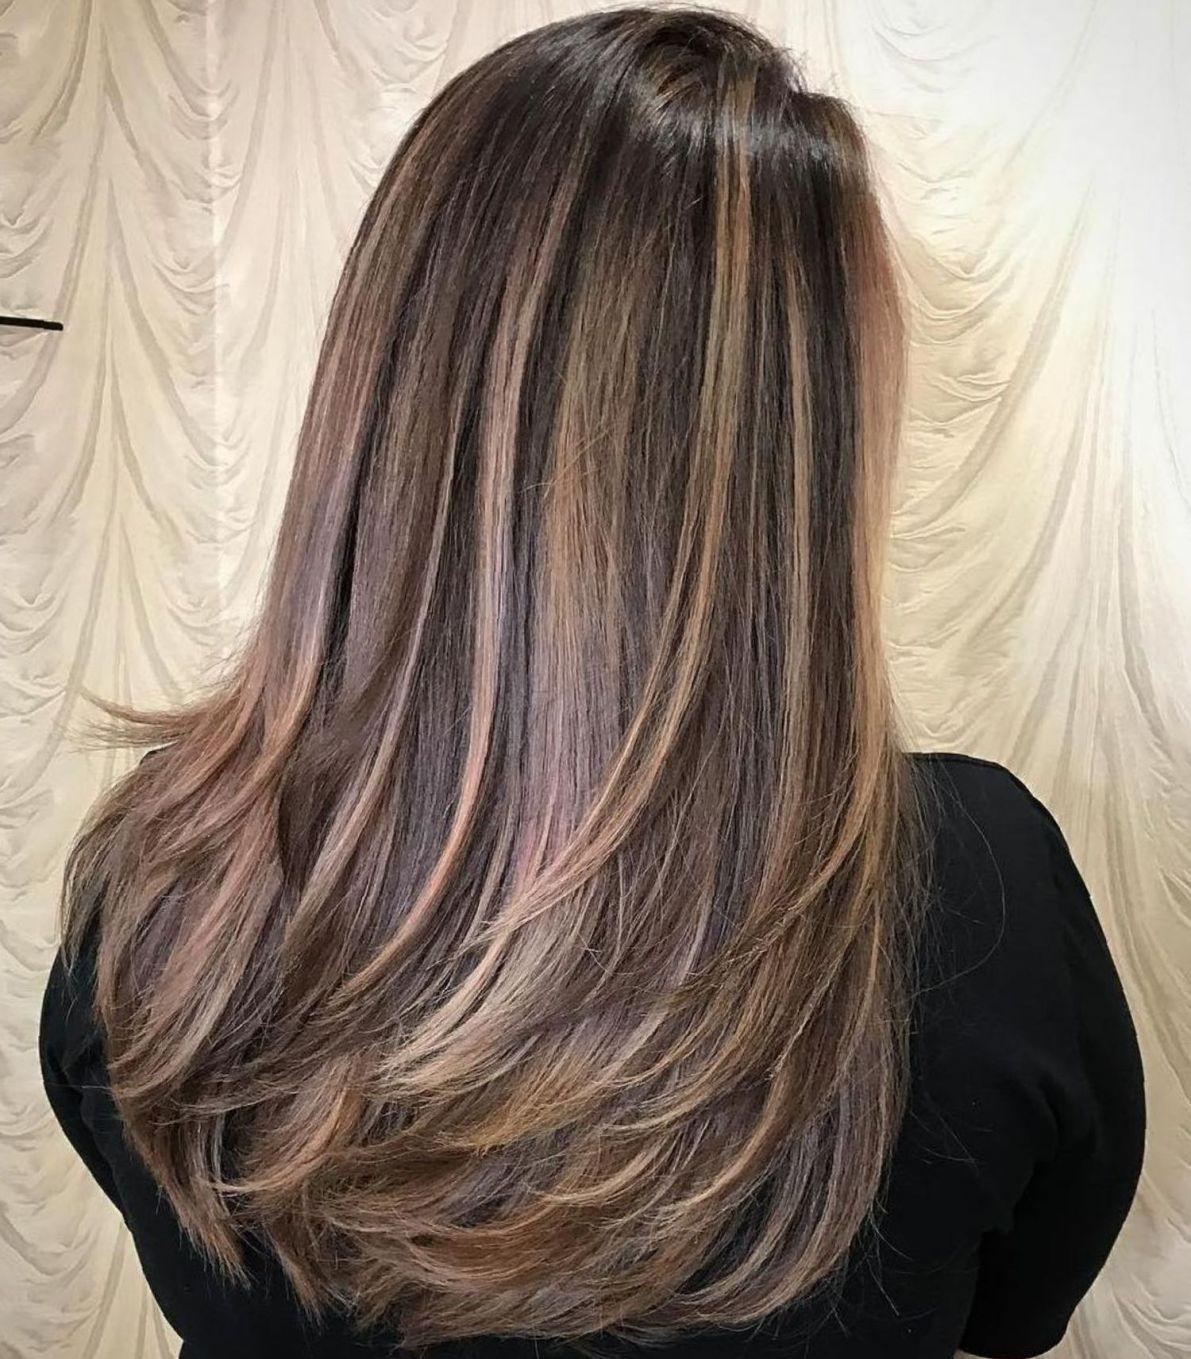 Layered Haircut For Long Thick Hair Thick Hair Styles Haircuts For Long Hair Haircut For Thick Hair